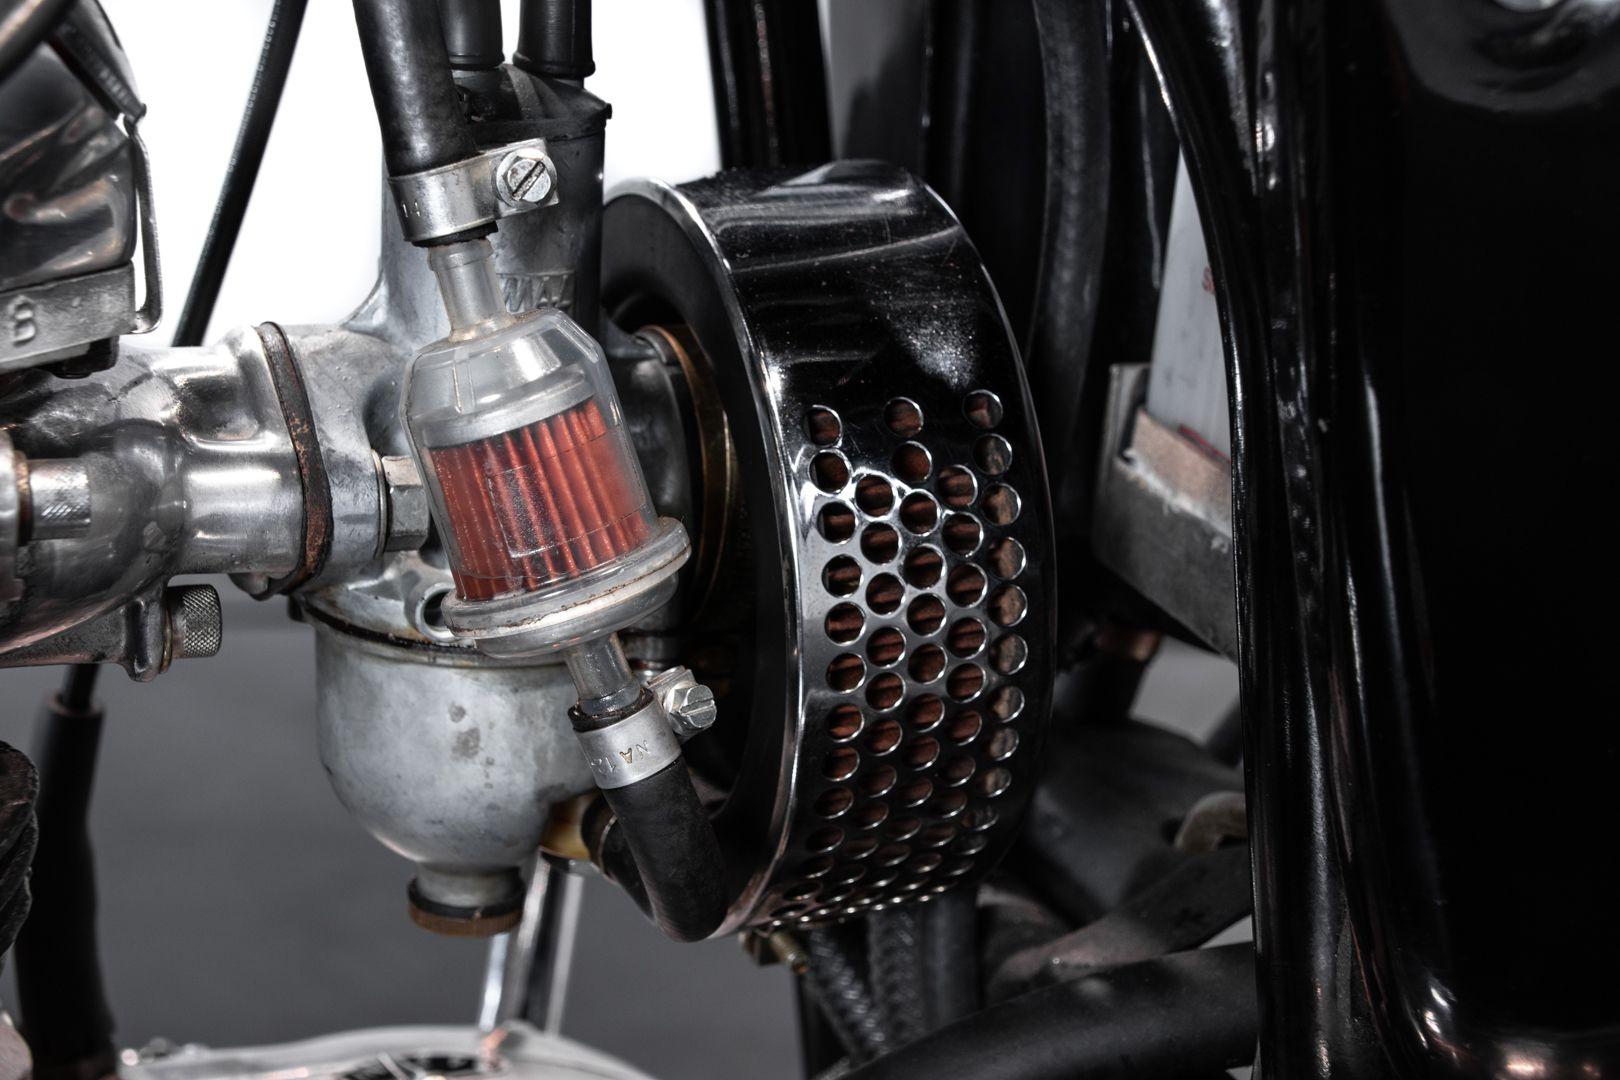 1970 Triumph TRIBSA 500 69922